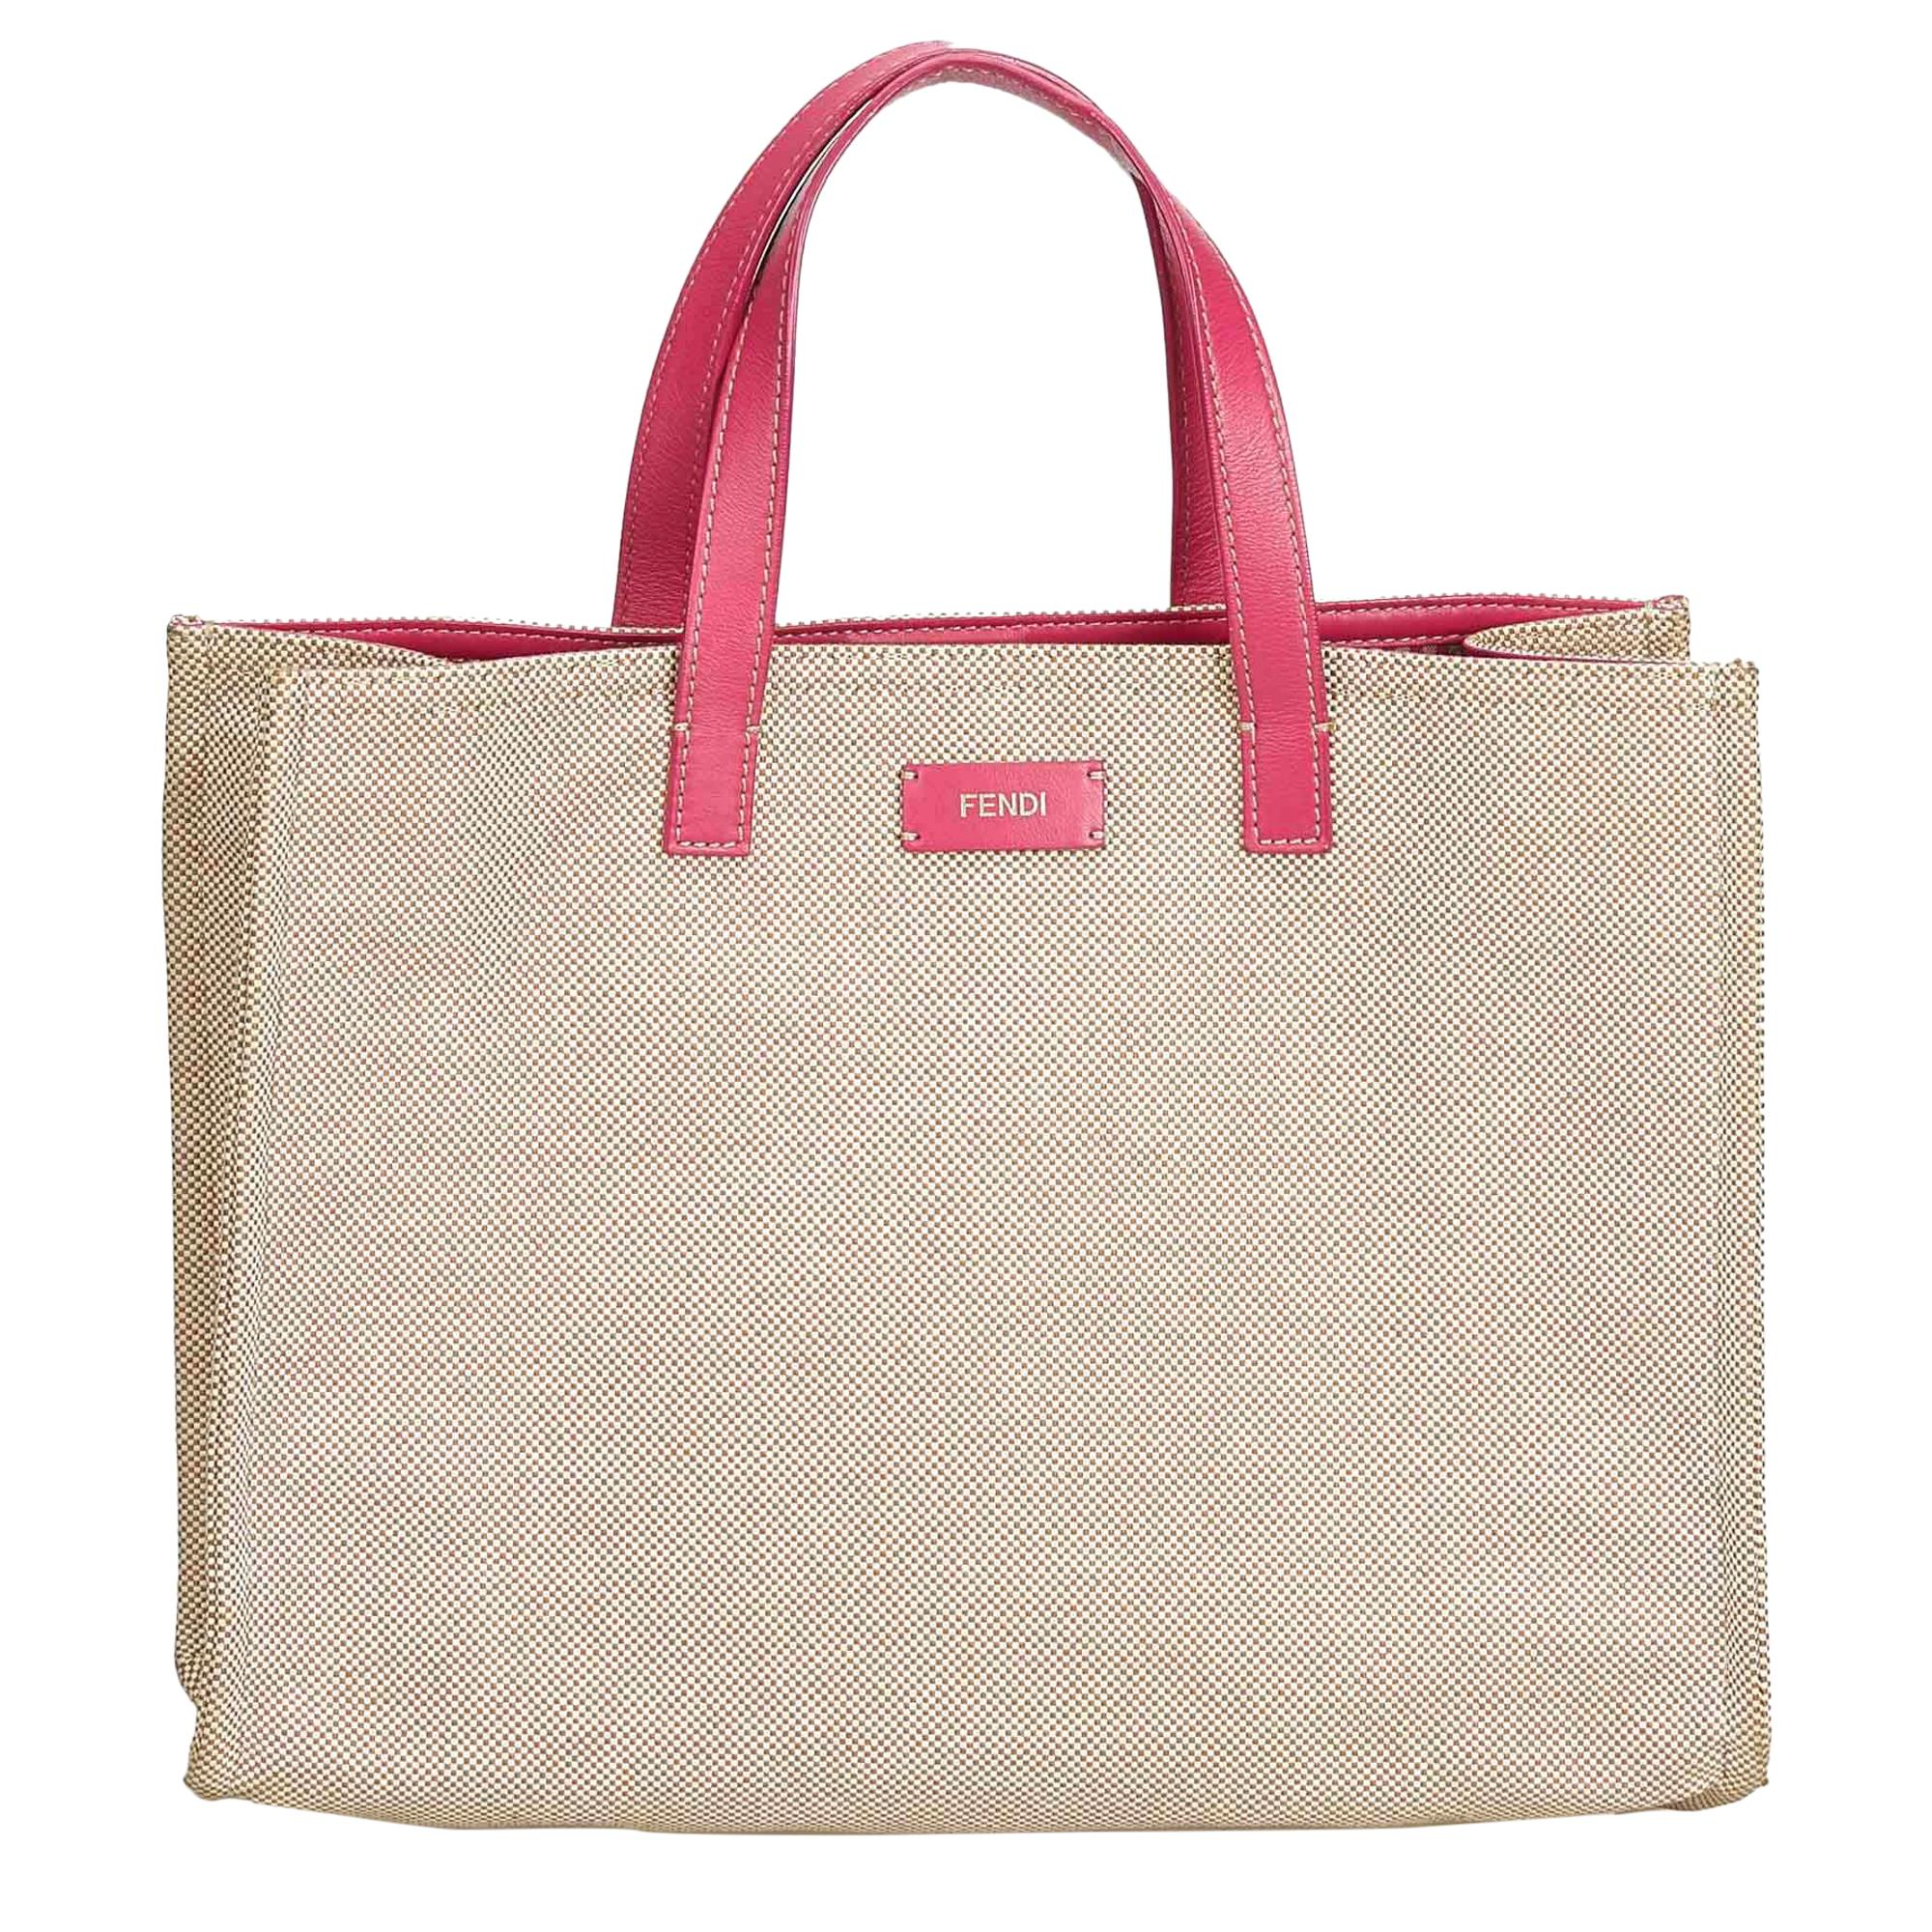 cca7d411 Vintage Fendi Handbags and Purses - 967 For Sale at 1stdibs